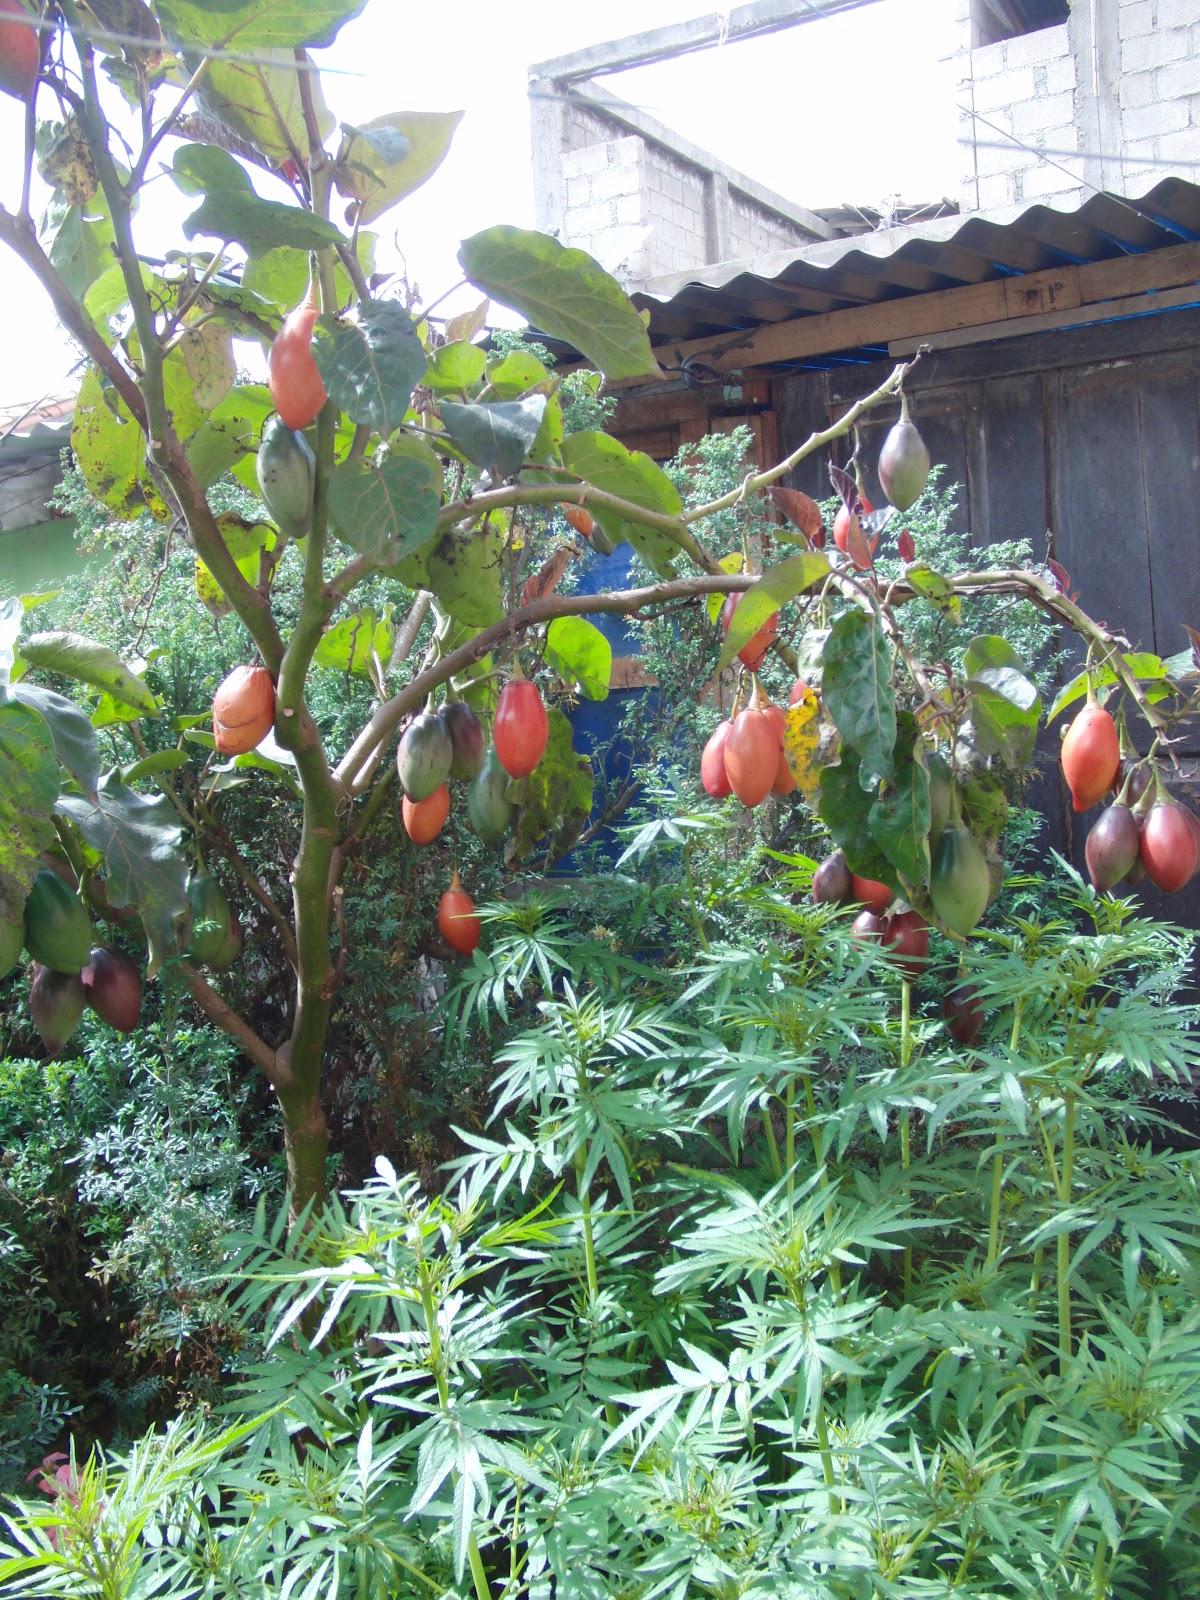 chukiyawunkirïtwa mermelada de sach a tomate tomate de árbol